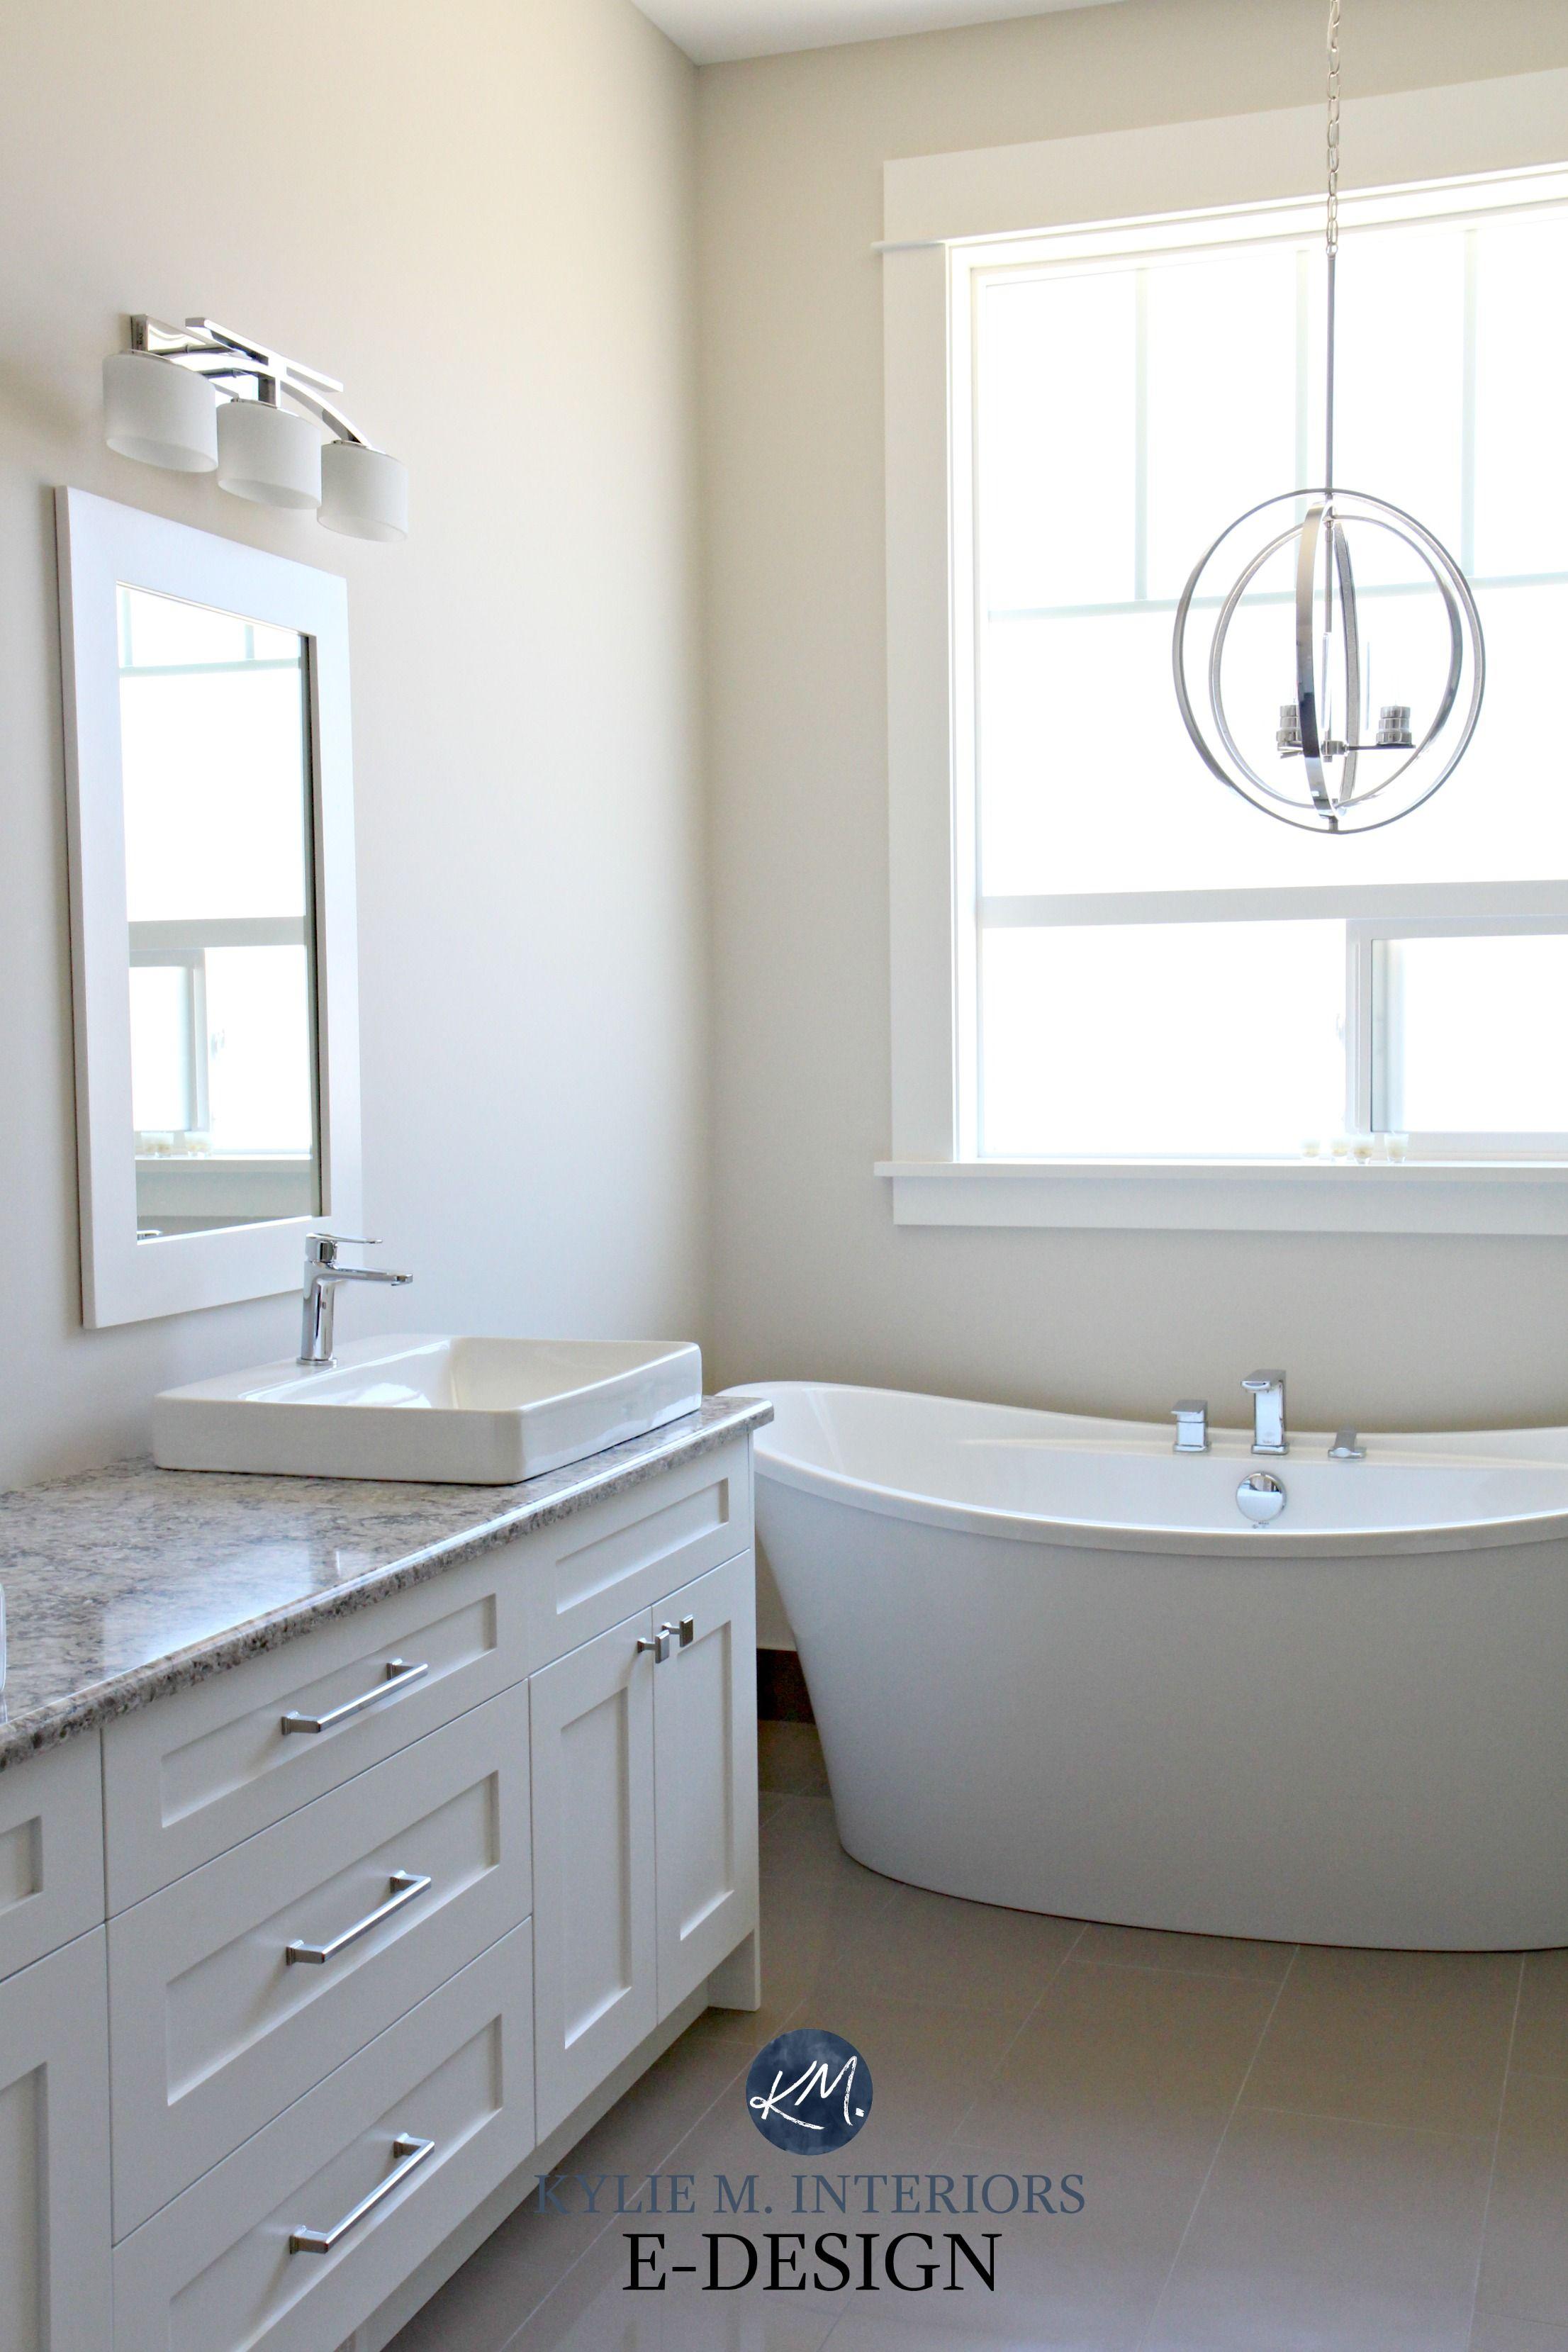 The 5 Best Off White Neutral Paint Colours Undertones And More In 2020 Best White Paint Off White Paint Colors Bathroom Paint Colors Sherwin Williams